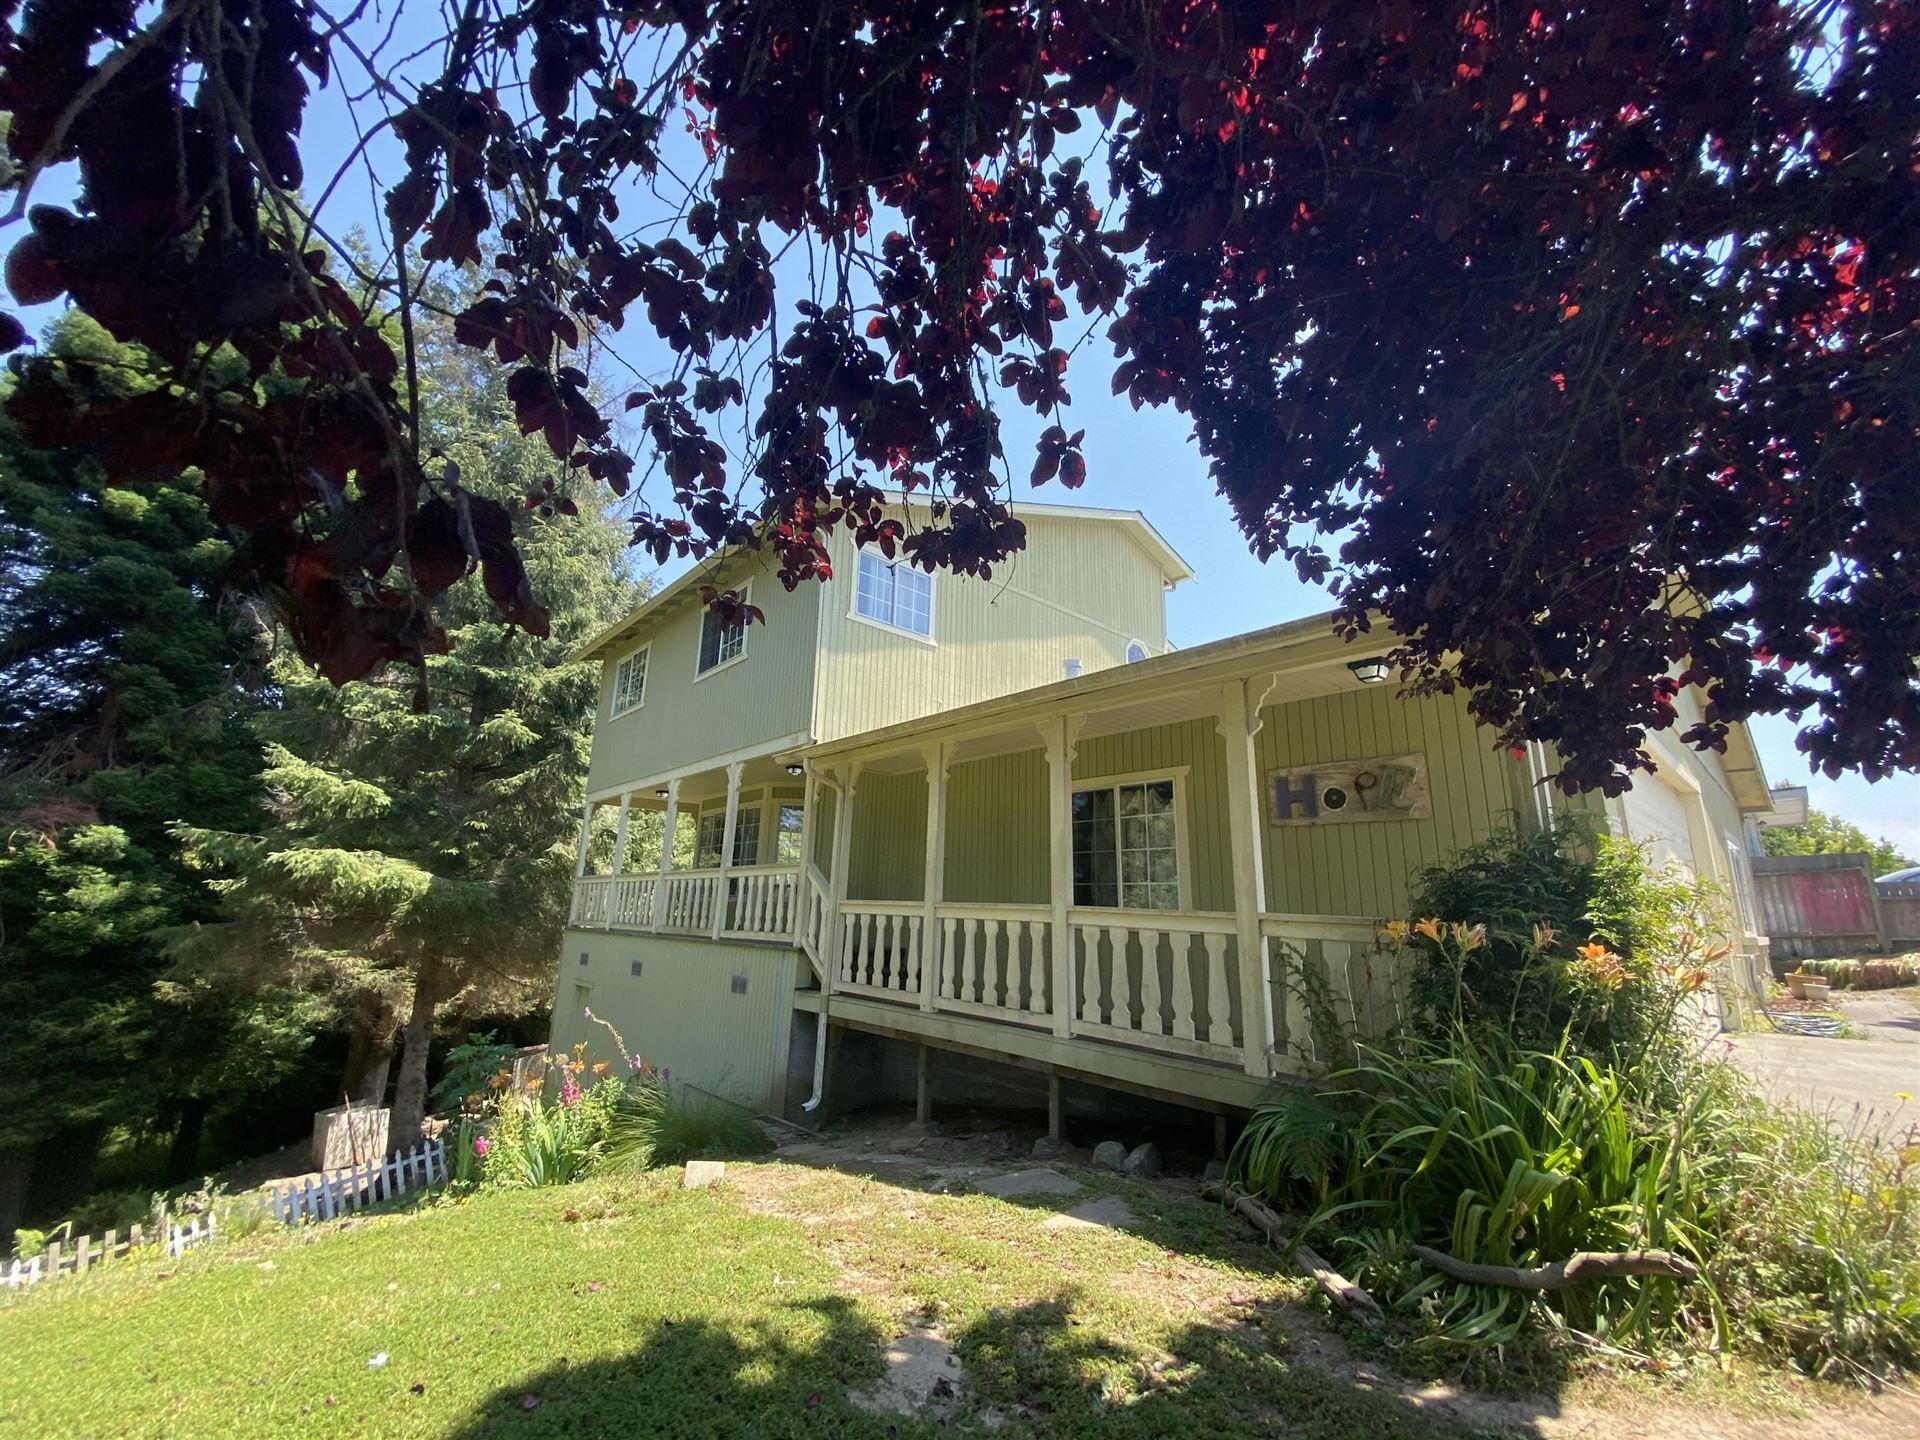 1555 Harrison Avenue, Eureka, CA 95501 - MLS#: 256982